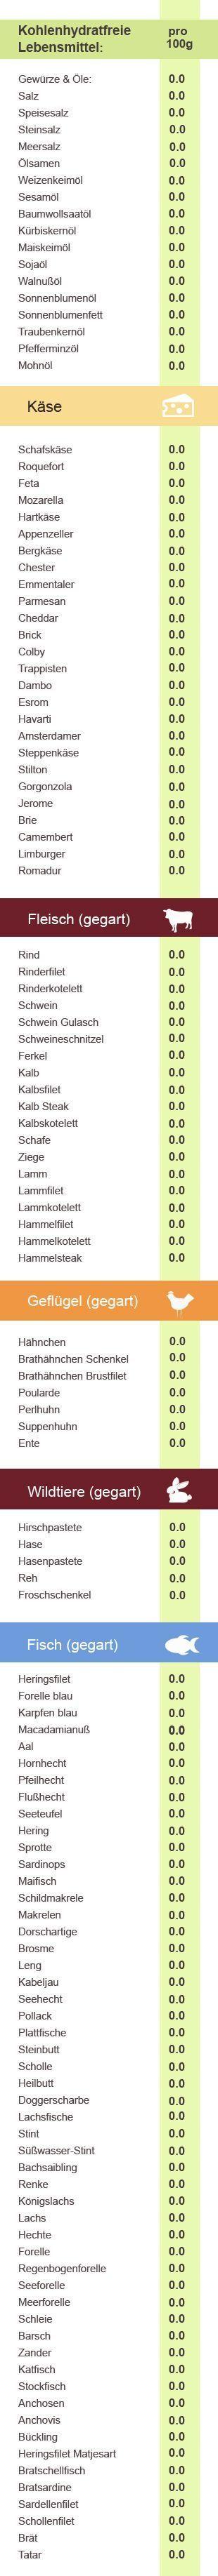 tabelle lebensmittel ohne kohlenhydrate